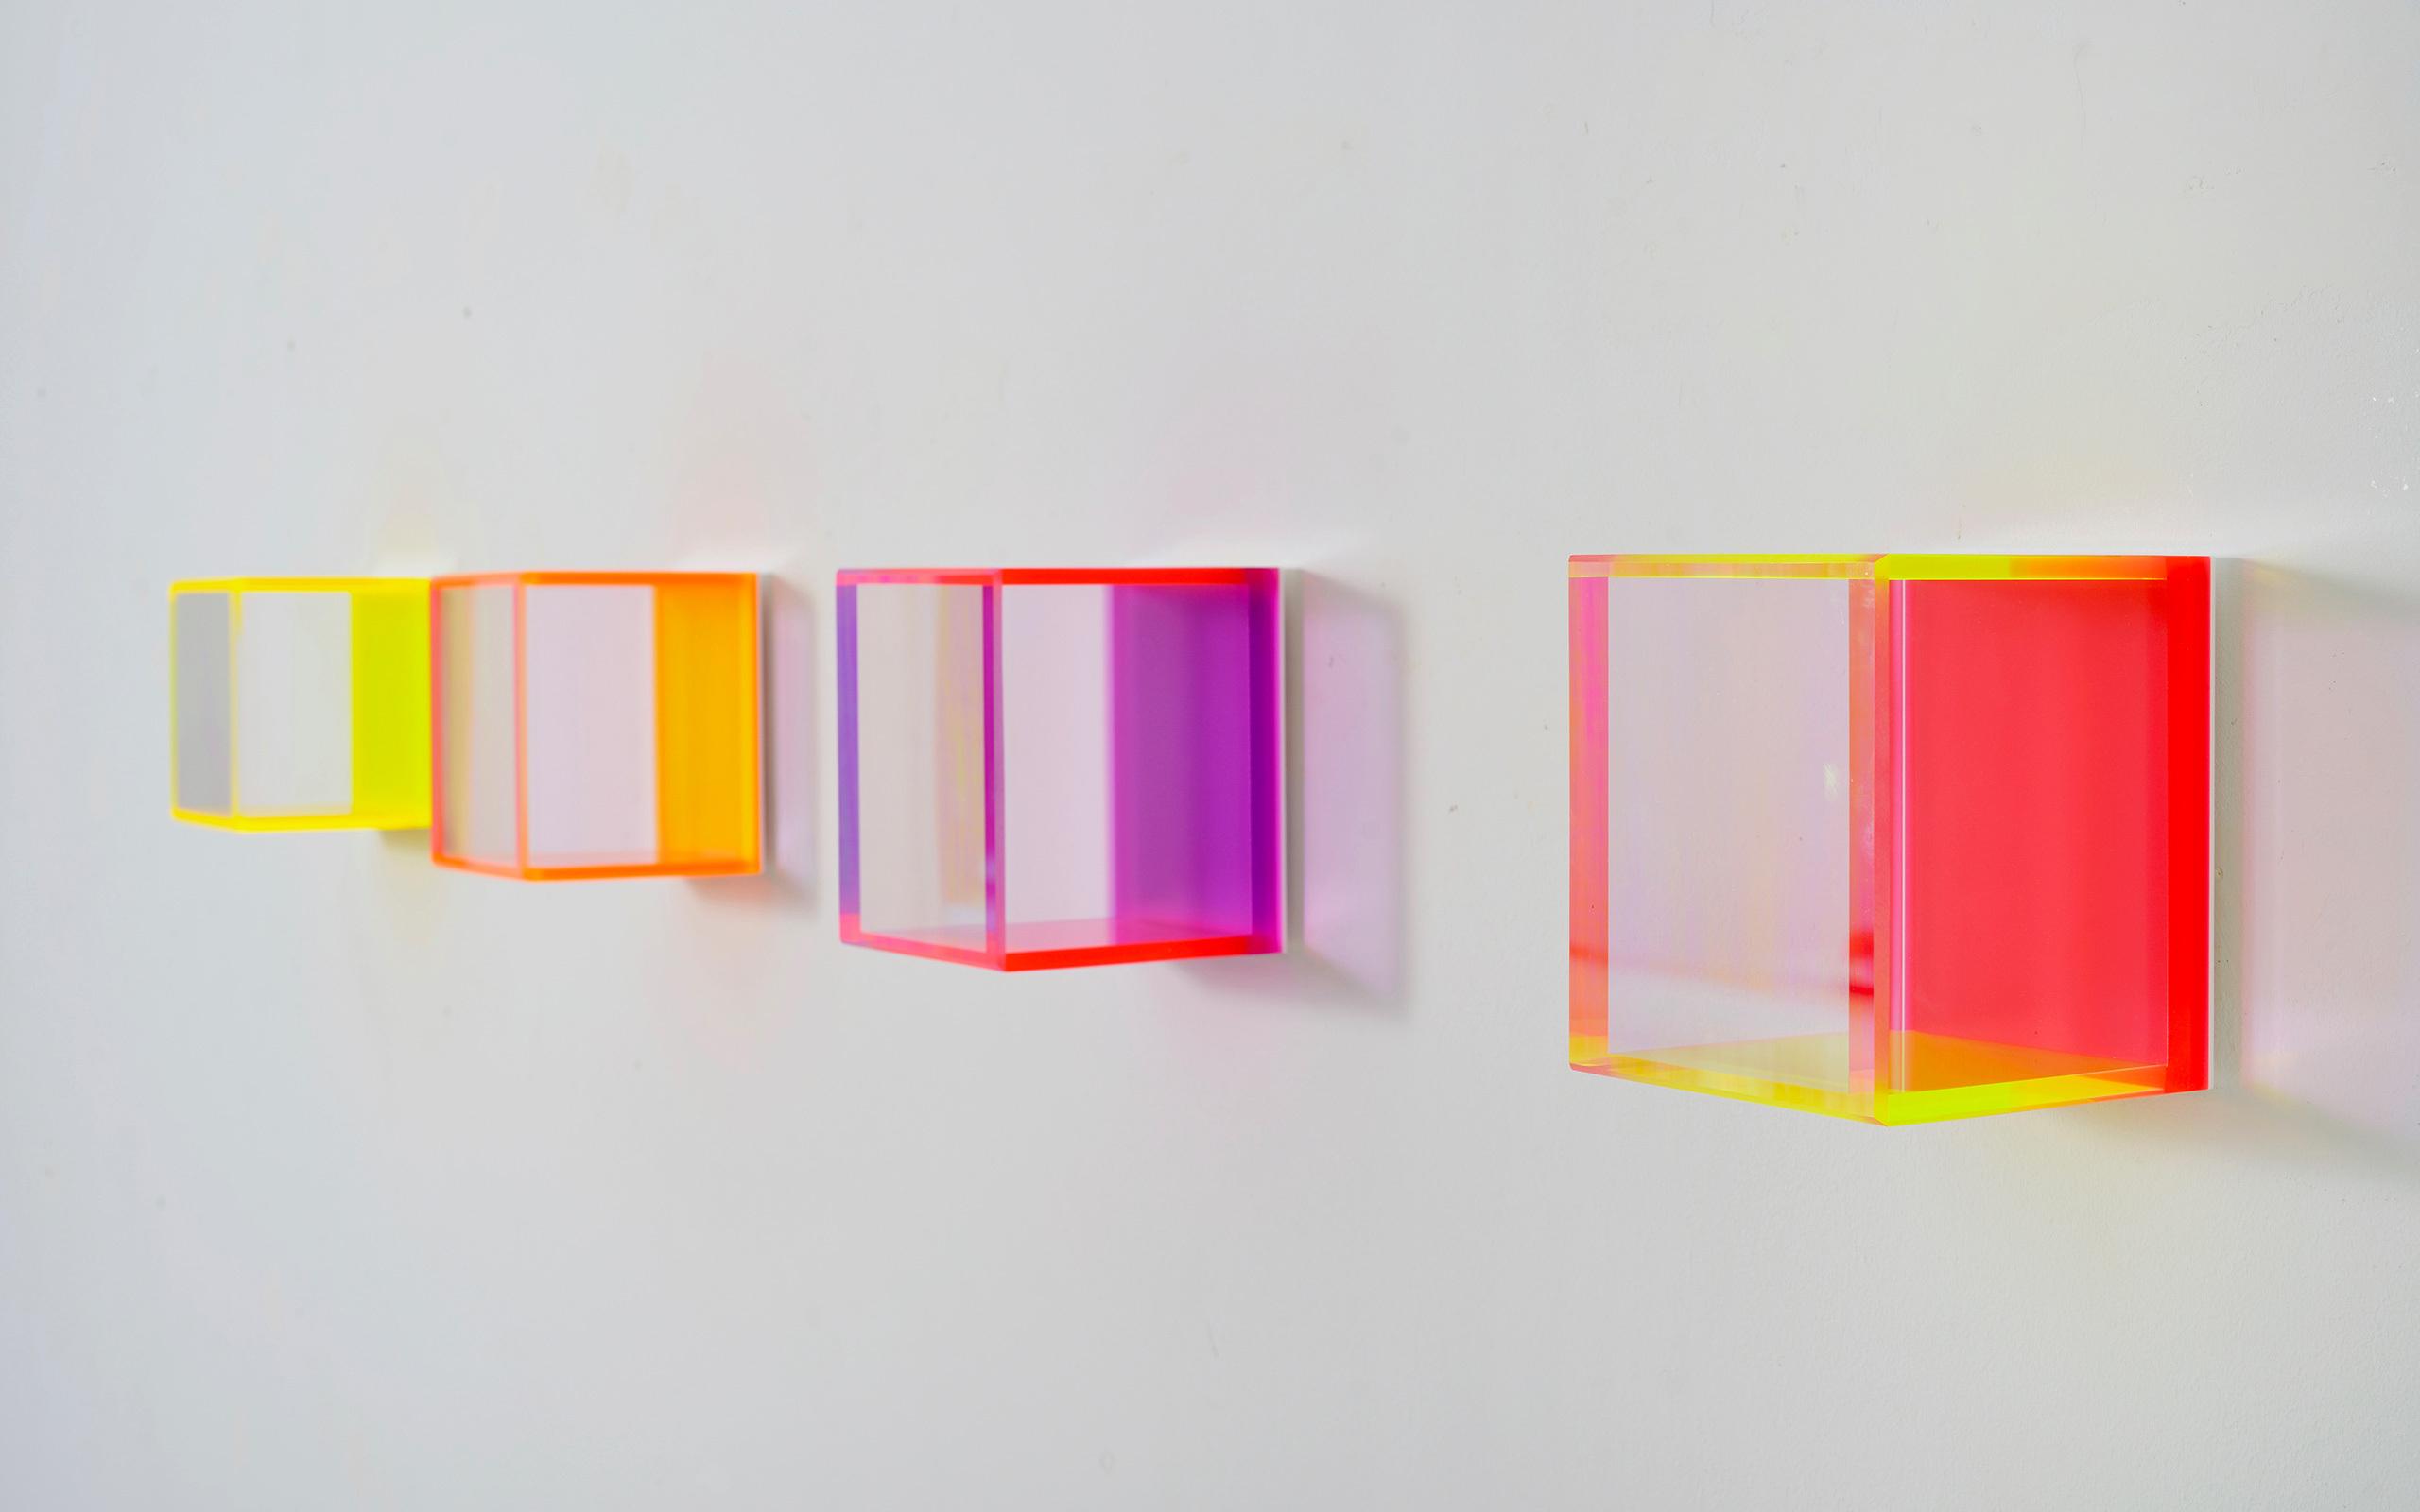 04 Regine Schumann Colormirror Rainbow Full Series 2020